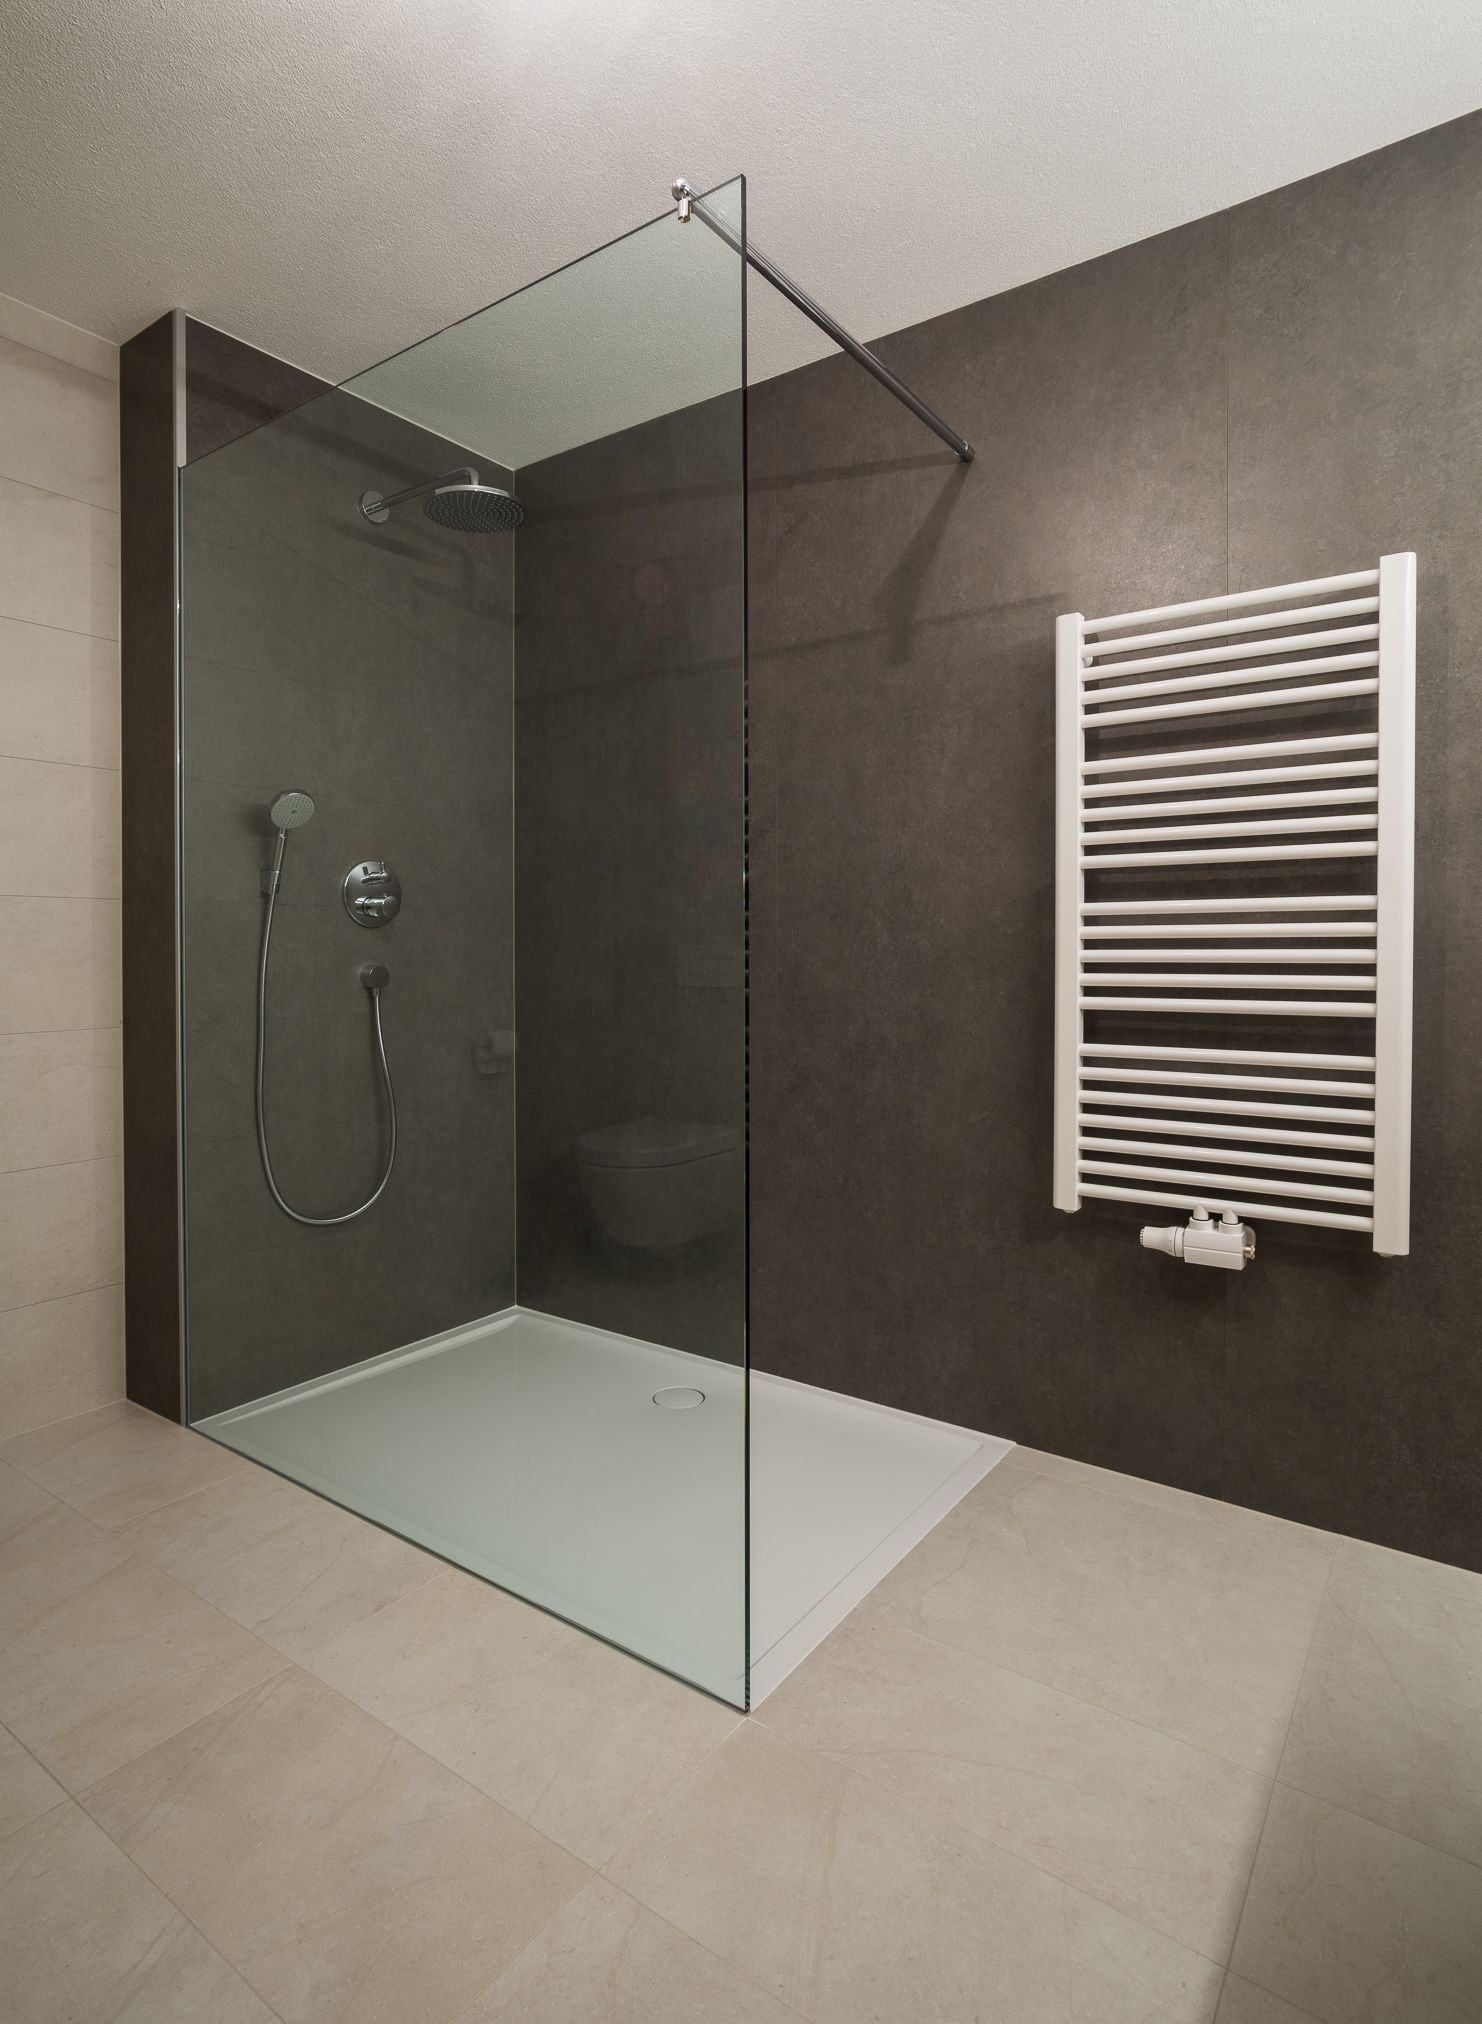 Grossformate Fliese Design Fliesenbau Dusche Badezimmer Design Badezimmerideen Badezimmer